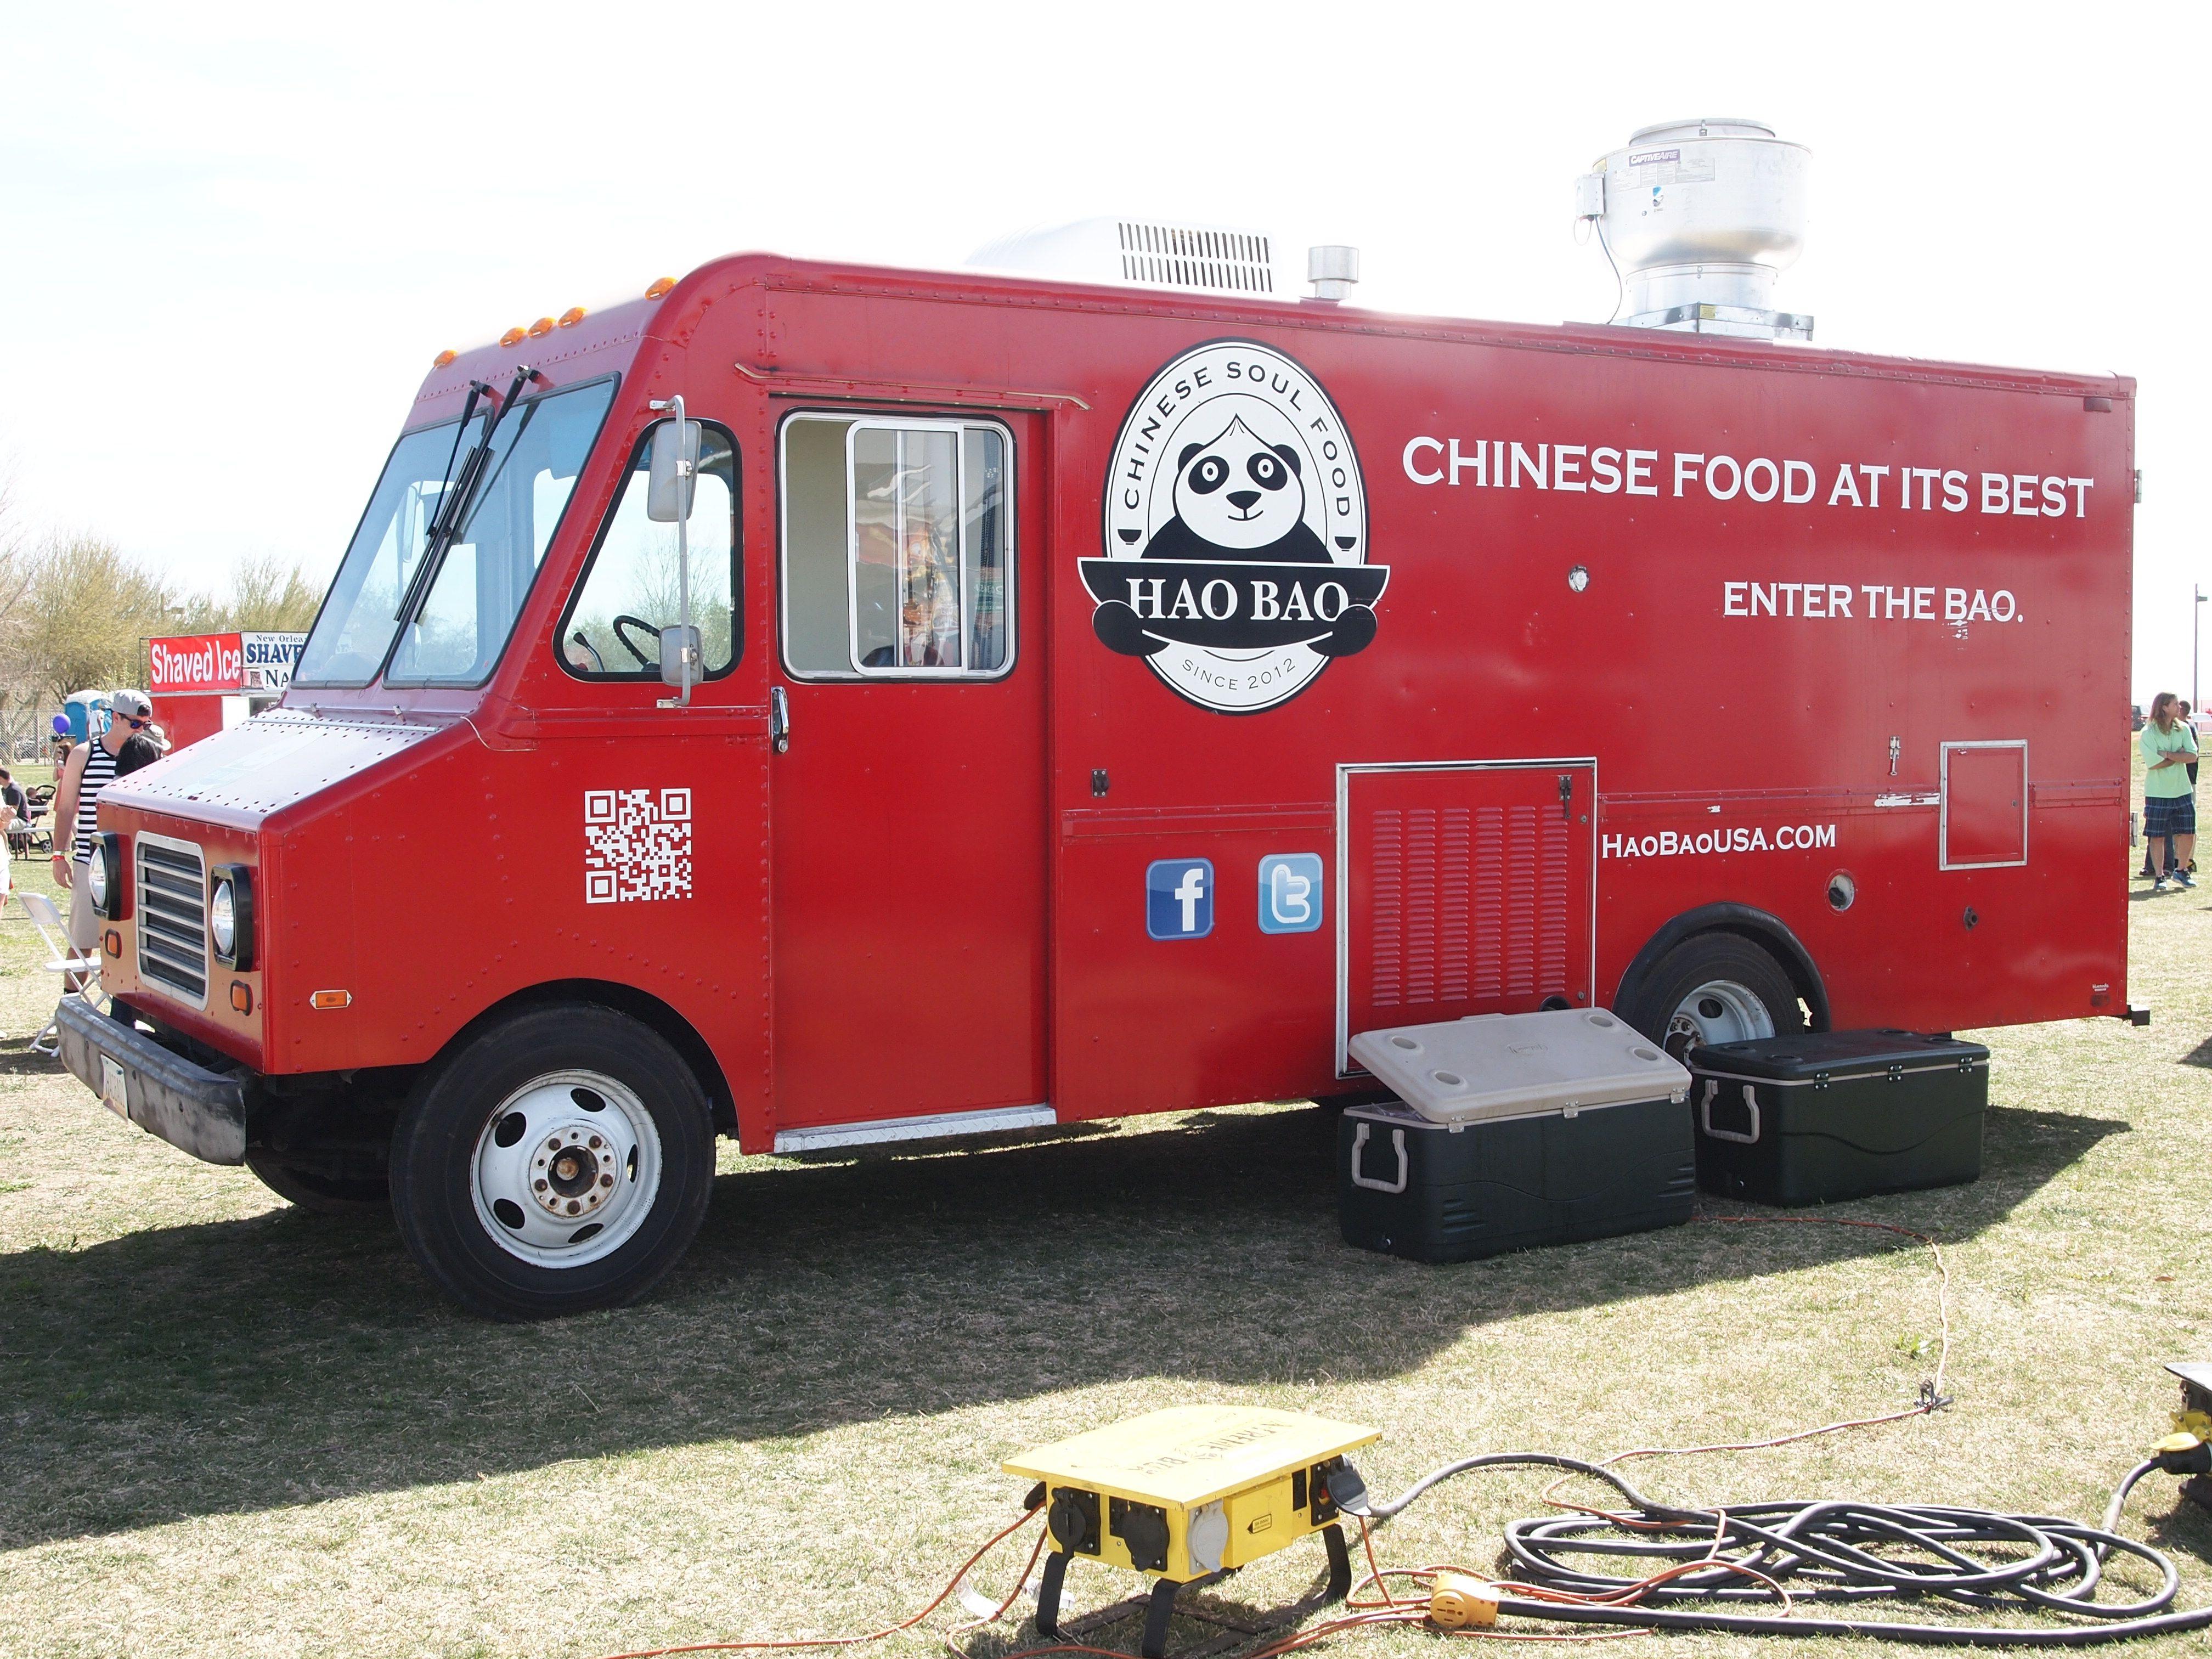 Pin By Jesse De Briones On Streetfood Az Noaz Arizona Phoenix Etc Food Truck Business Best Food Trucks Chinese Restaurant